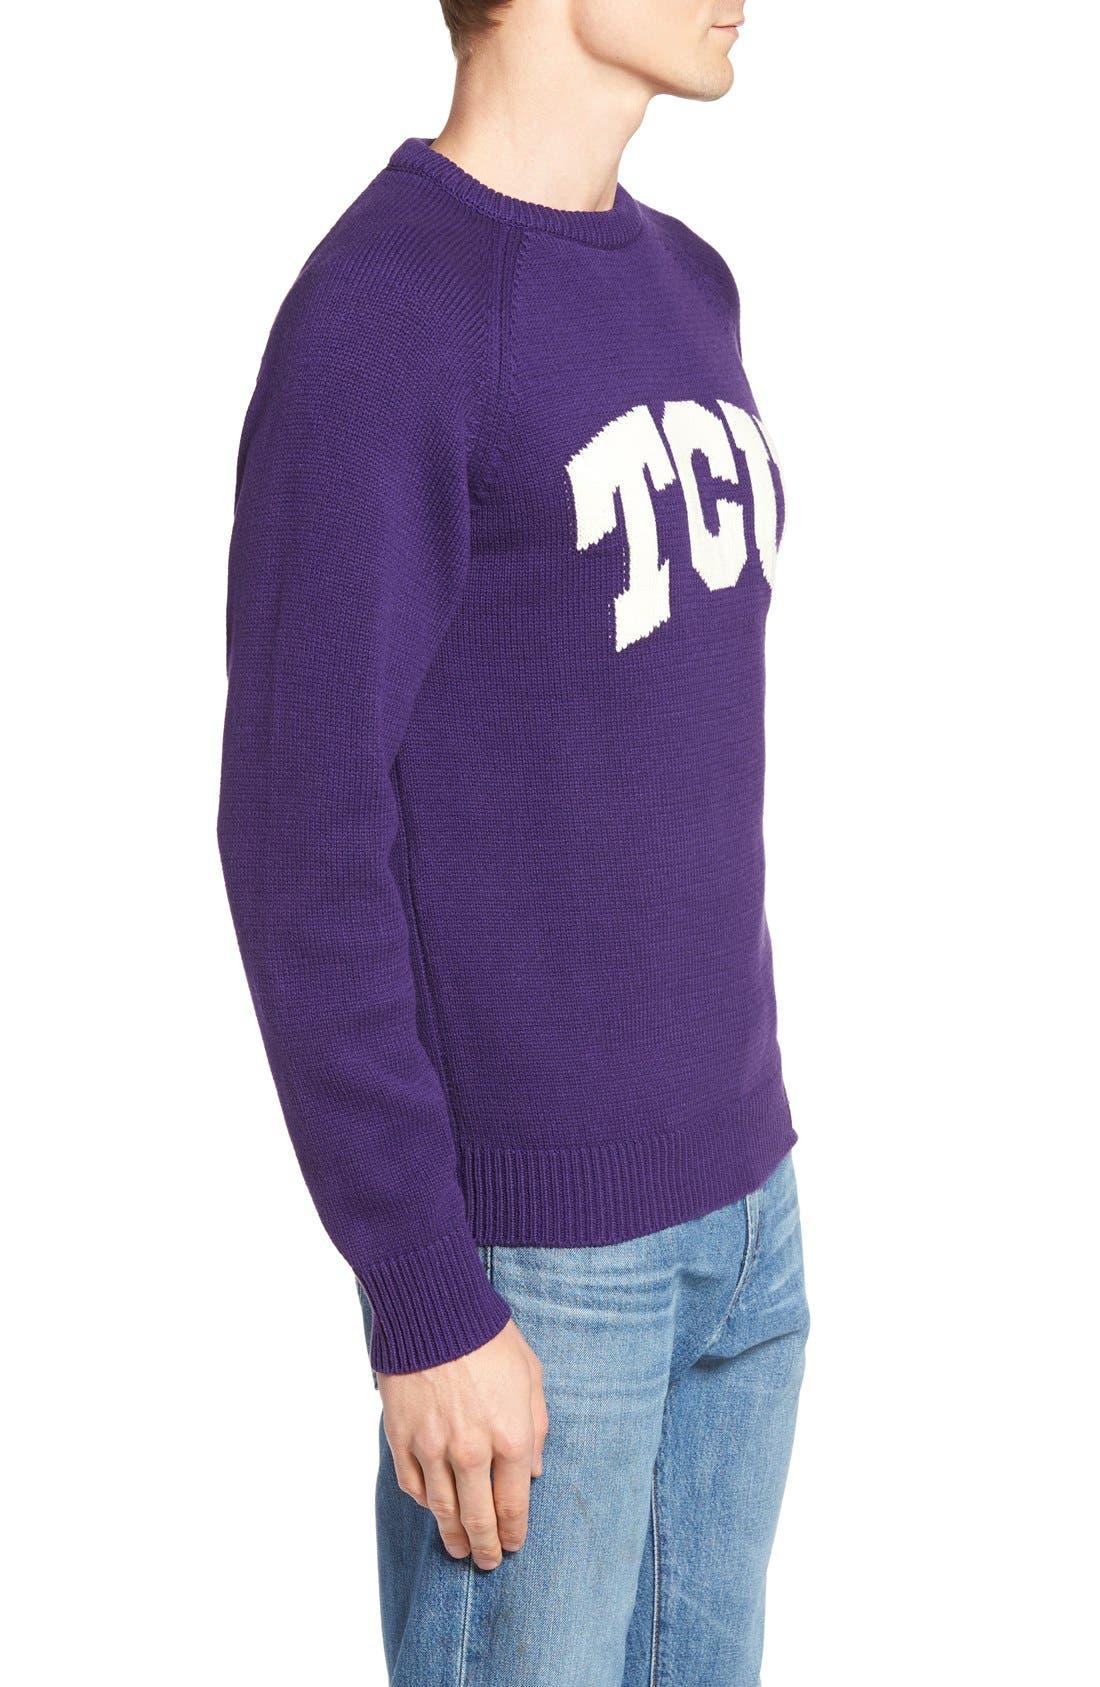 HILLFLINT,                             TCU Heritage Sweater,                             Alternate thumbnail 3, color,                             500